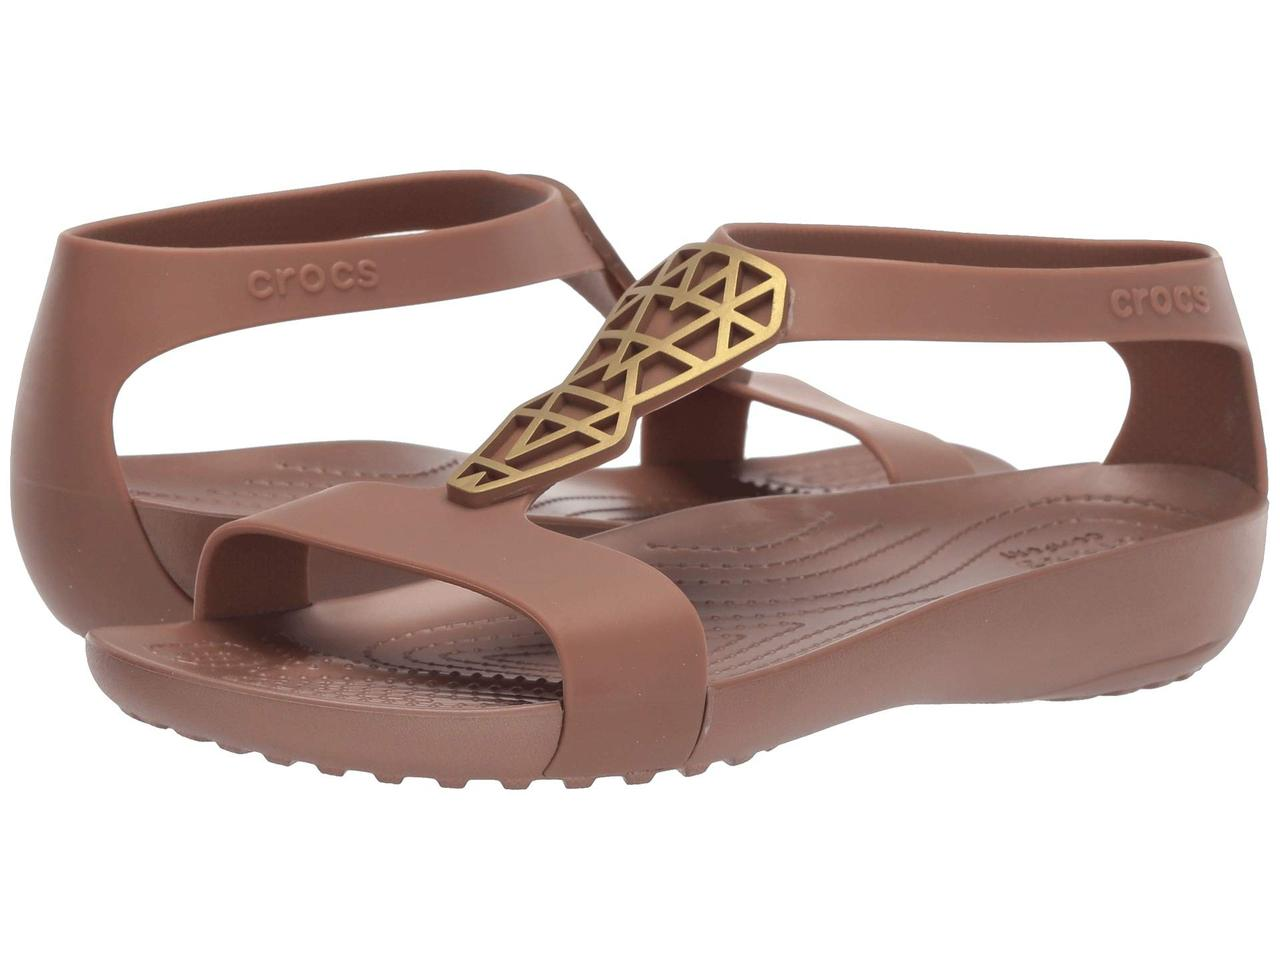 Сандалии женские Crocs Serena Embellished Sandal В, цвет: бронза. 205601-860. Размер 10 (40)205601-860